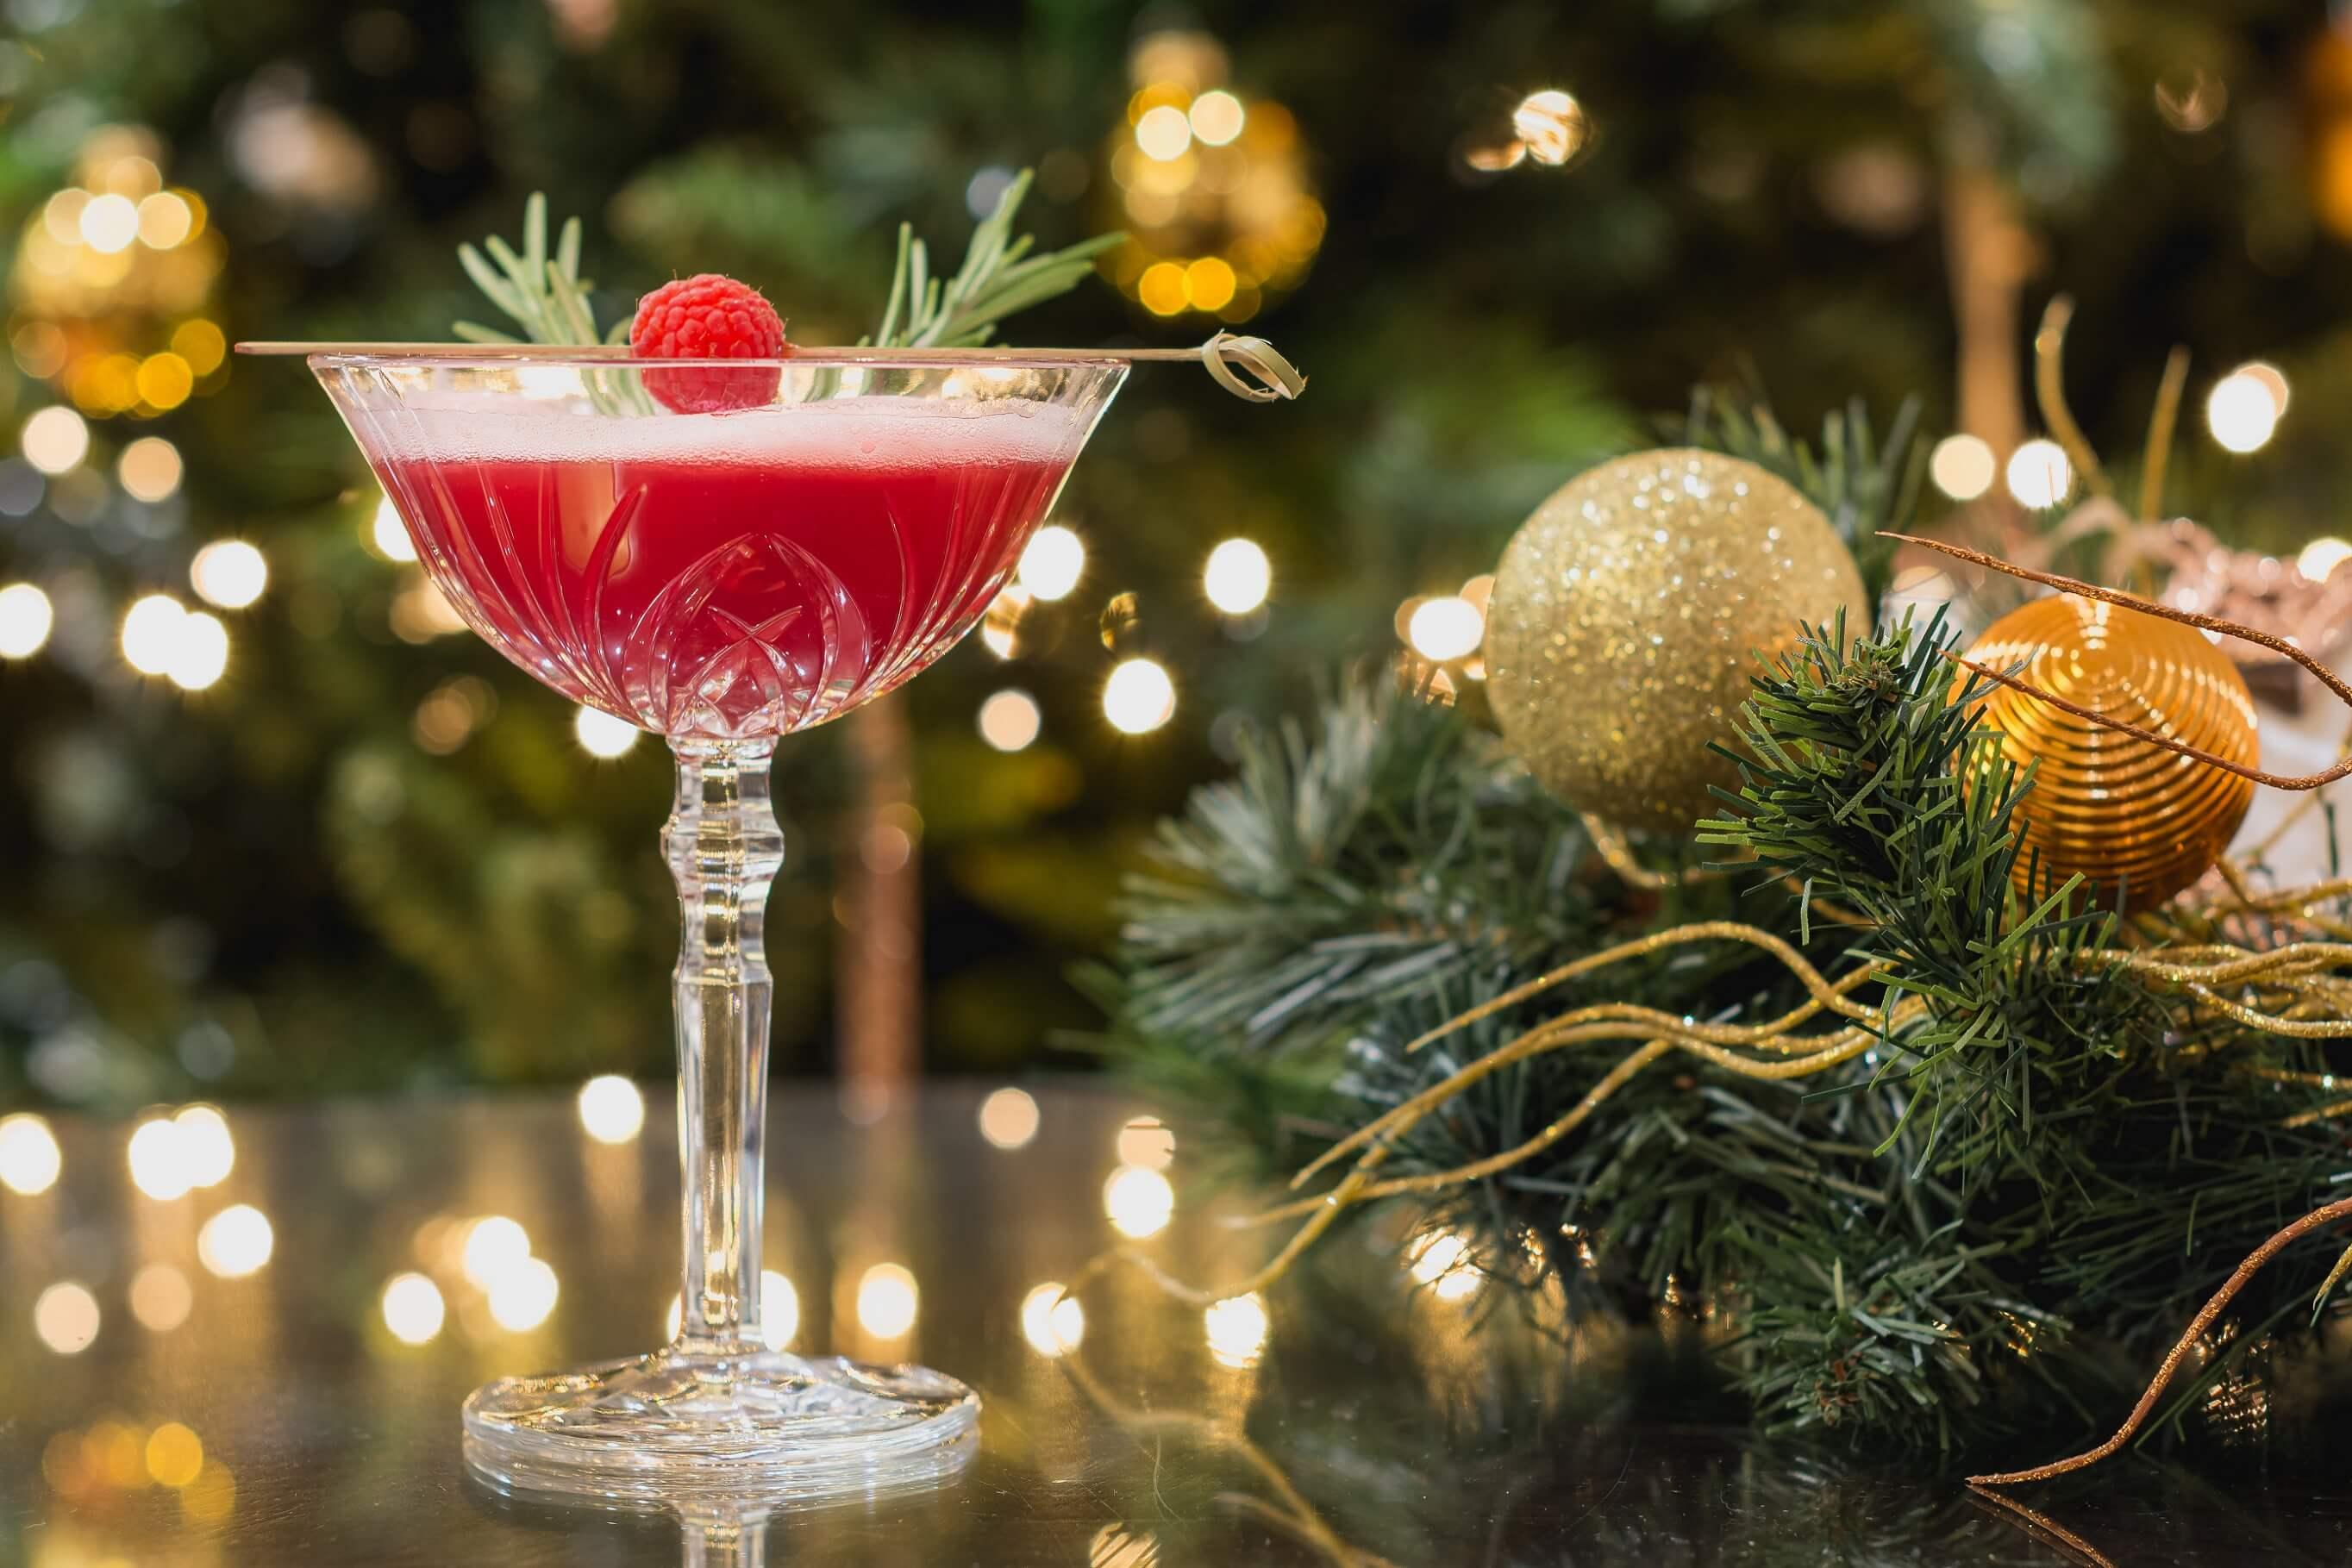 Red-Nosed Reindeer festive cocktail at mint bar